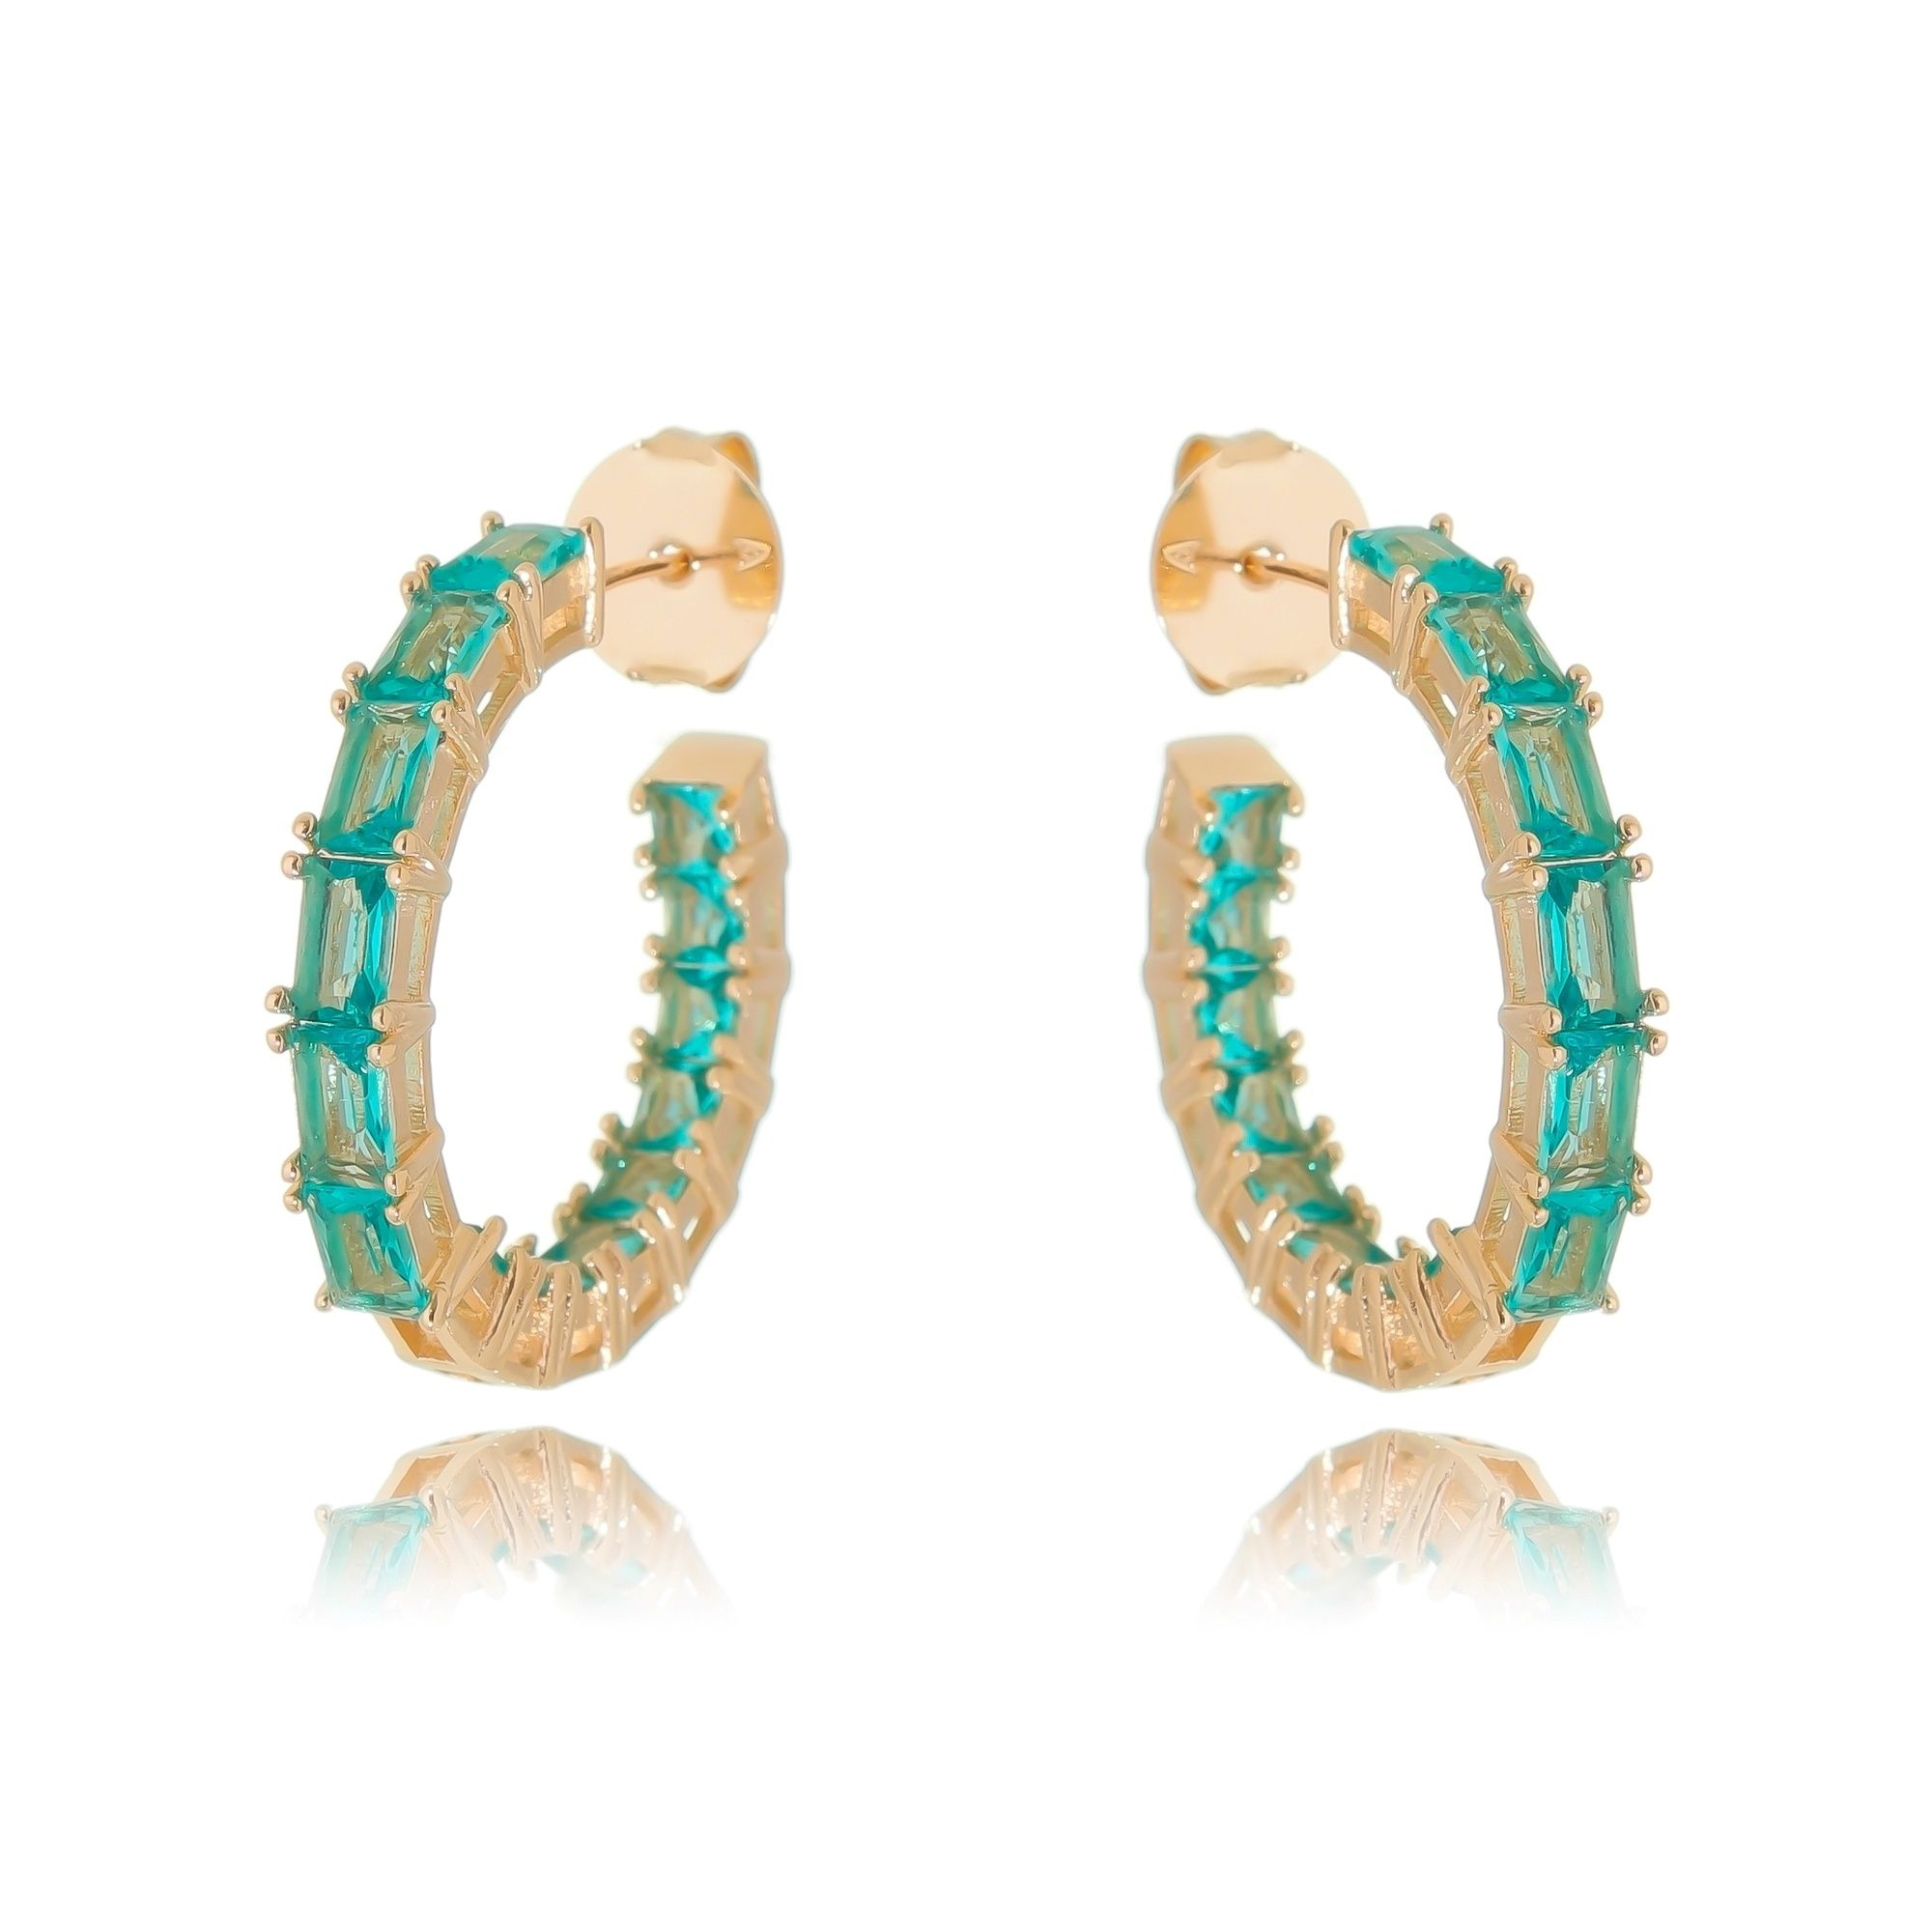 Argola Turmalina Fashion Cravejada Semijoia Ouro Rosé  - Soloyou